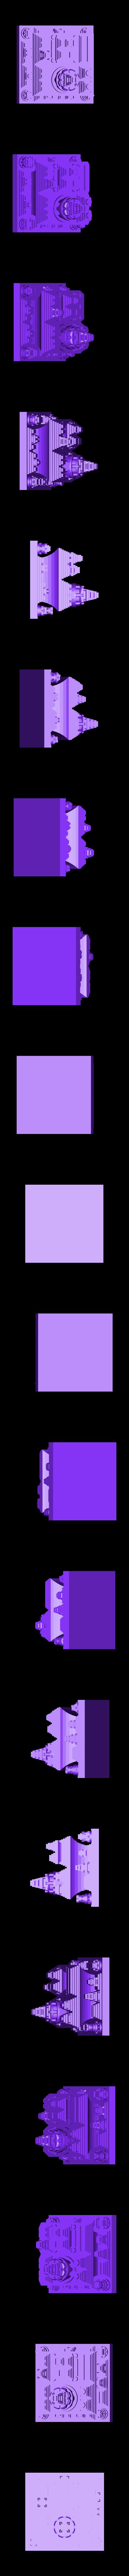 tetris_cities_O.stl Download free STL file Tetris Heart Puzzle • Design to 3D print, ferjerez3d